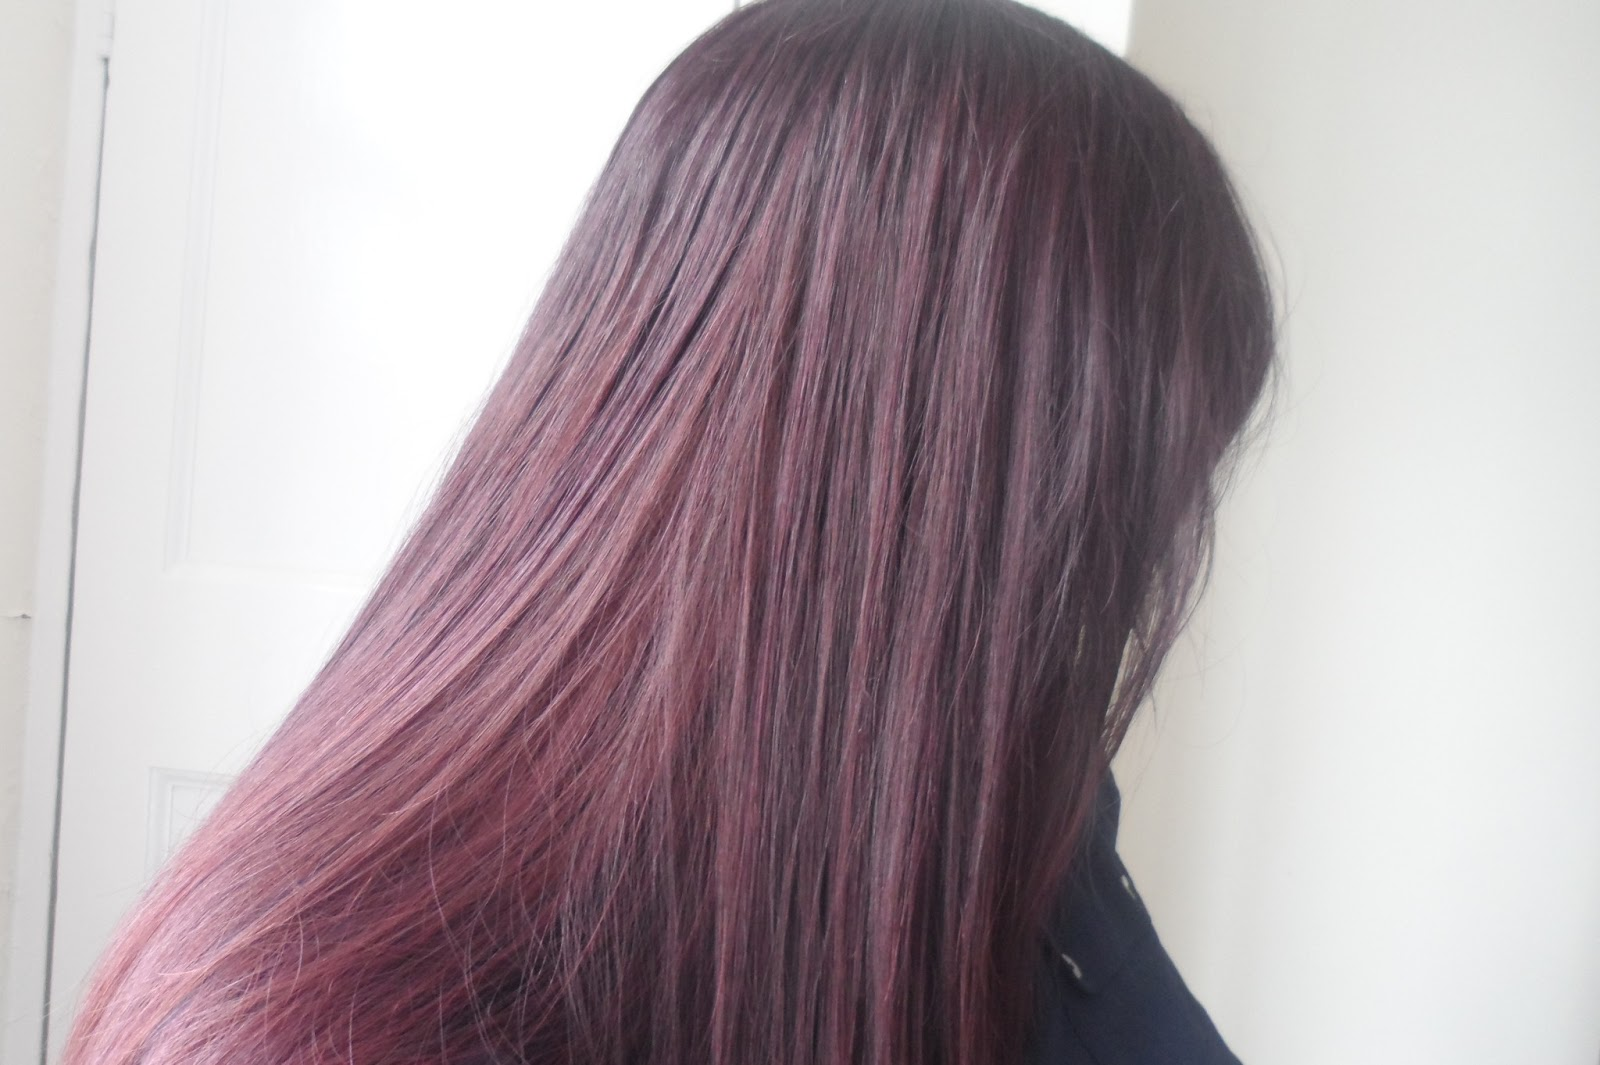 Ribena Coloured Hair With Loreal Casting Creme Gloss In 316 Plum